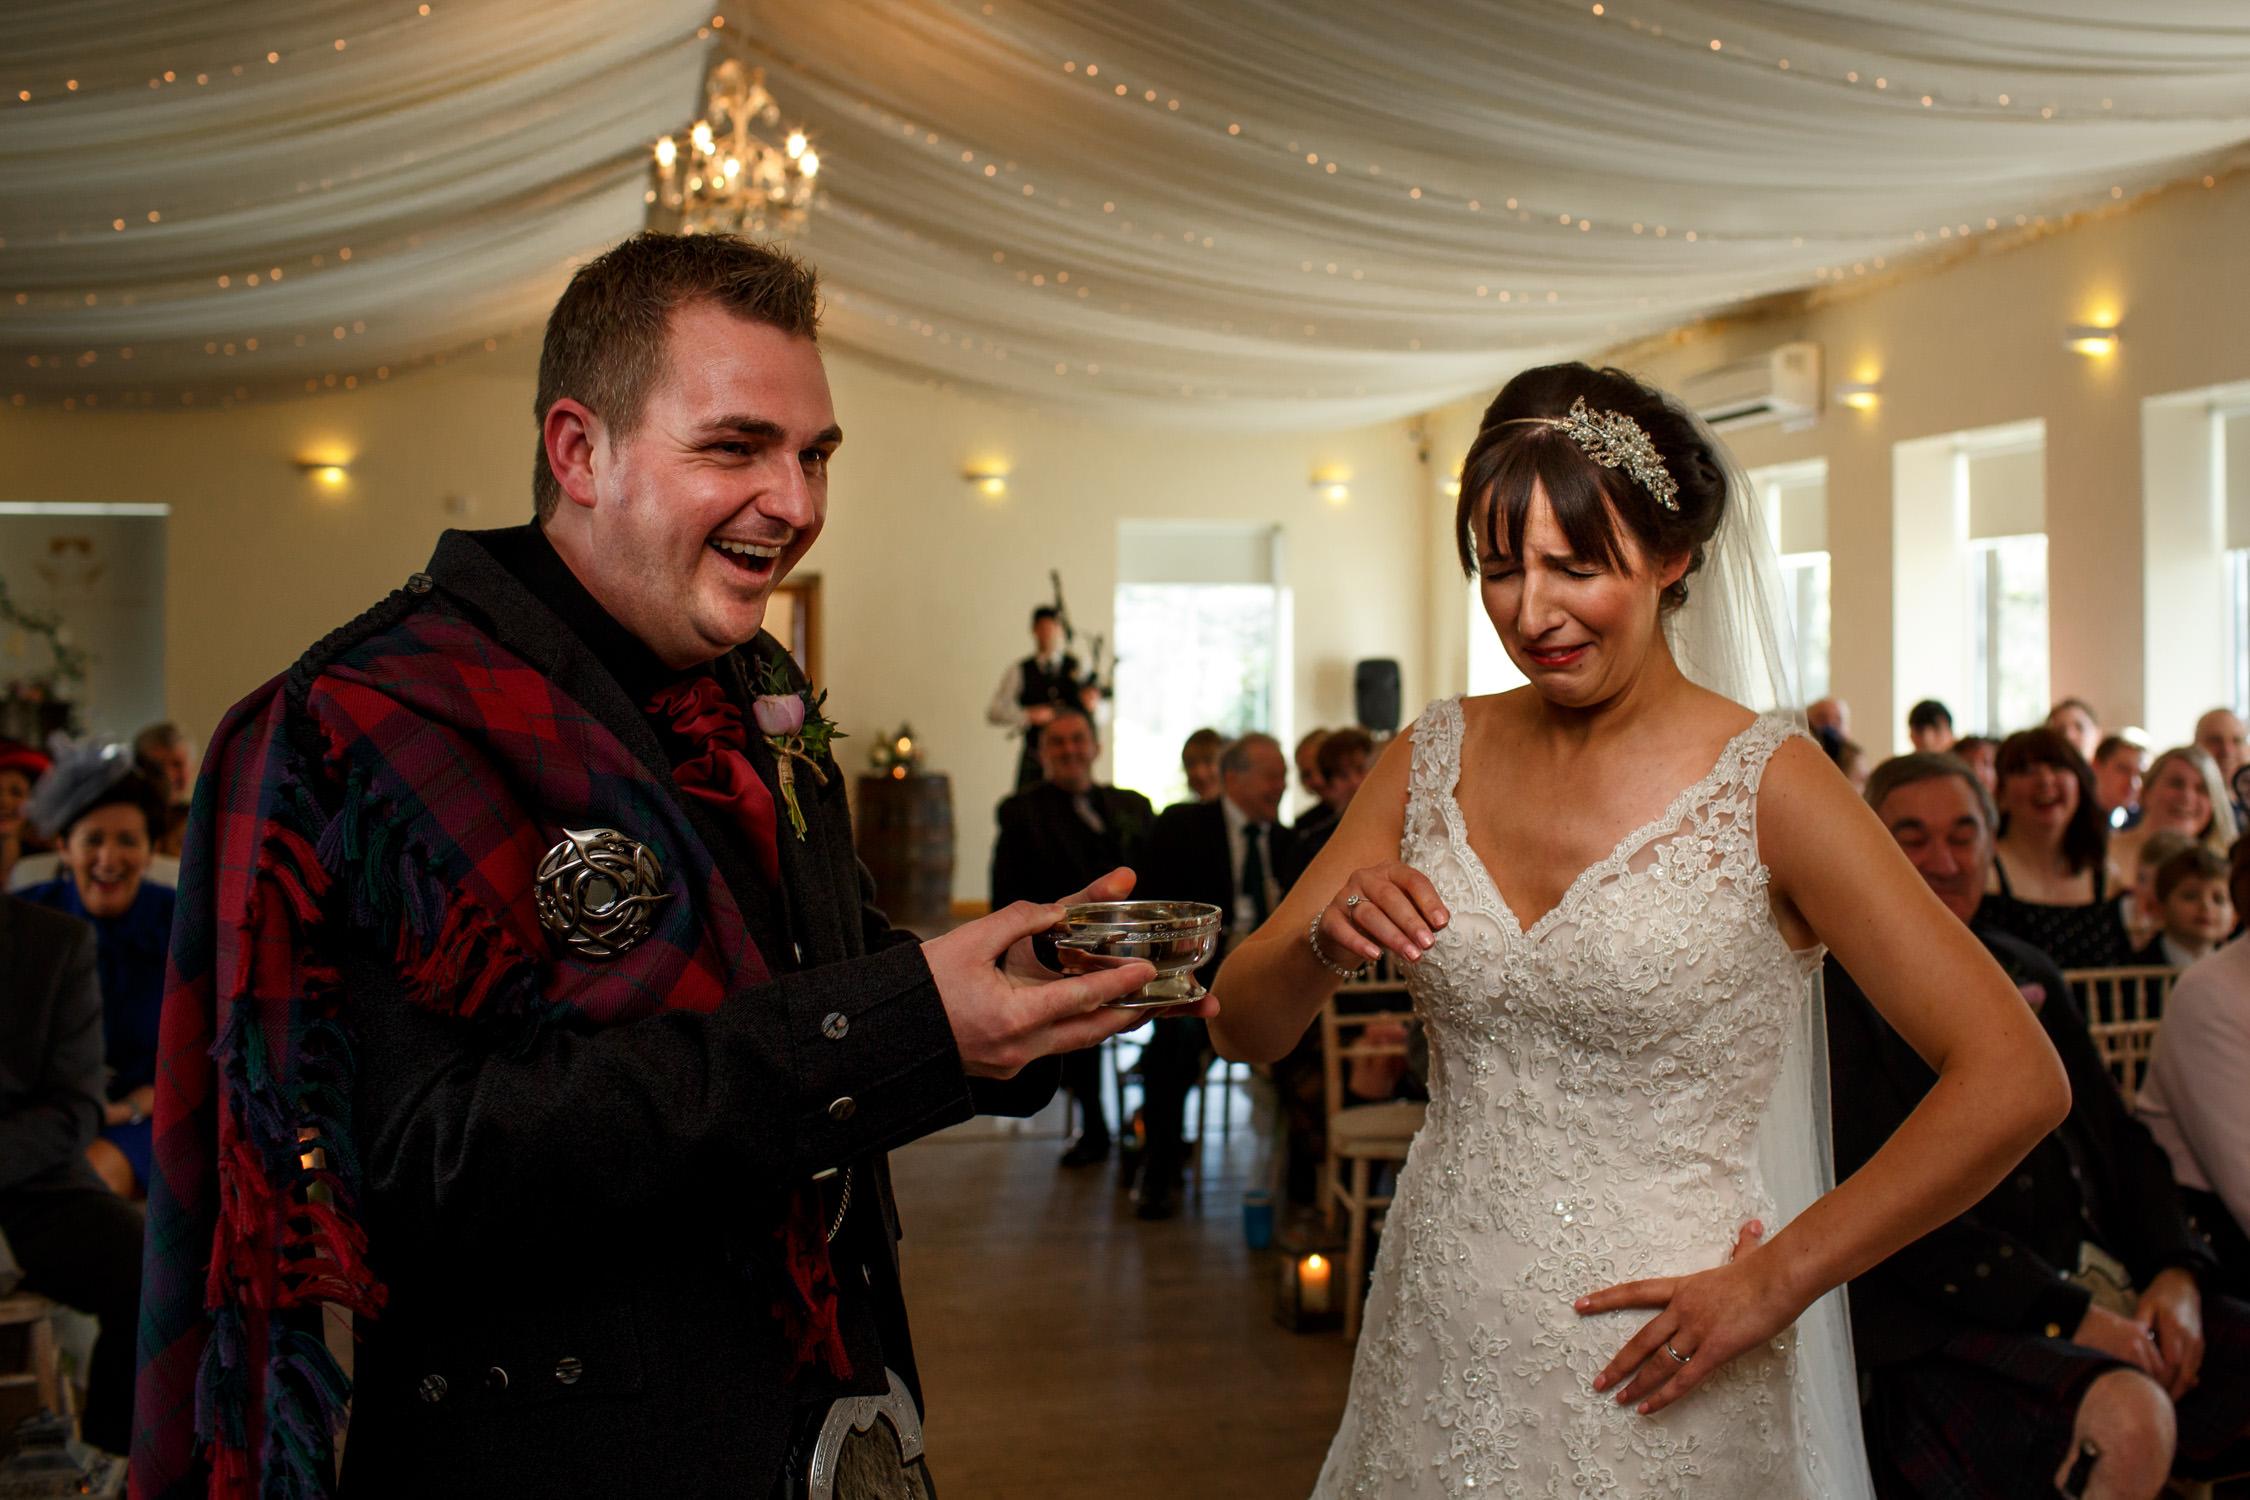 Scotland Wedding photographer, natural wedding photos, Edinburgh Wedding, Fingask Castle, Documentary Wedding photographer , Autumn wedding , Winter wedding photographs, creative wedding photographs , Barry Robb Photography